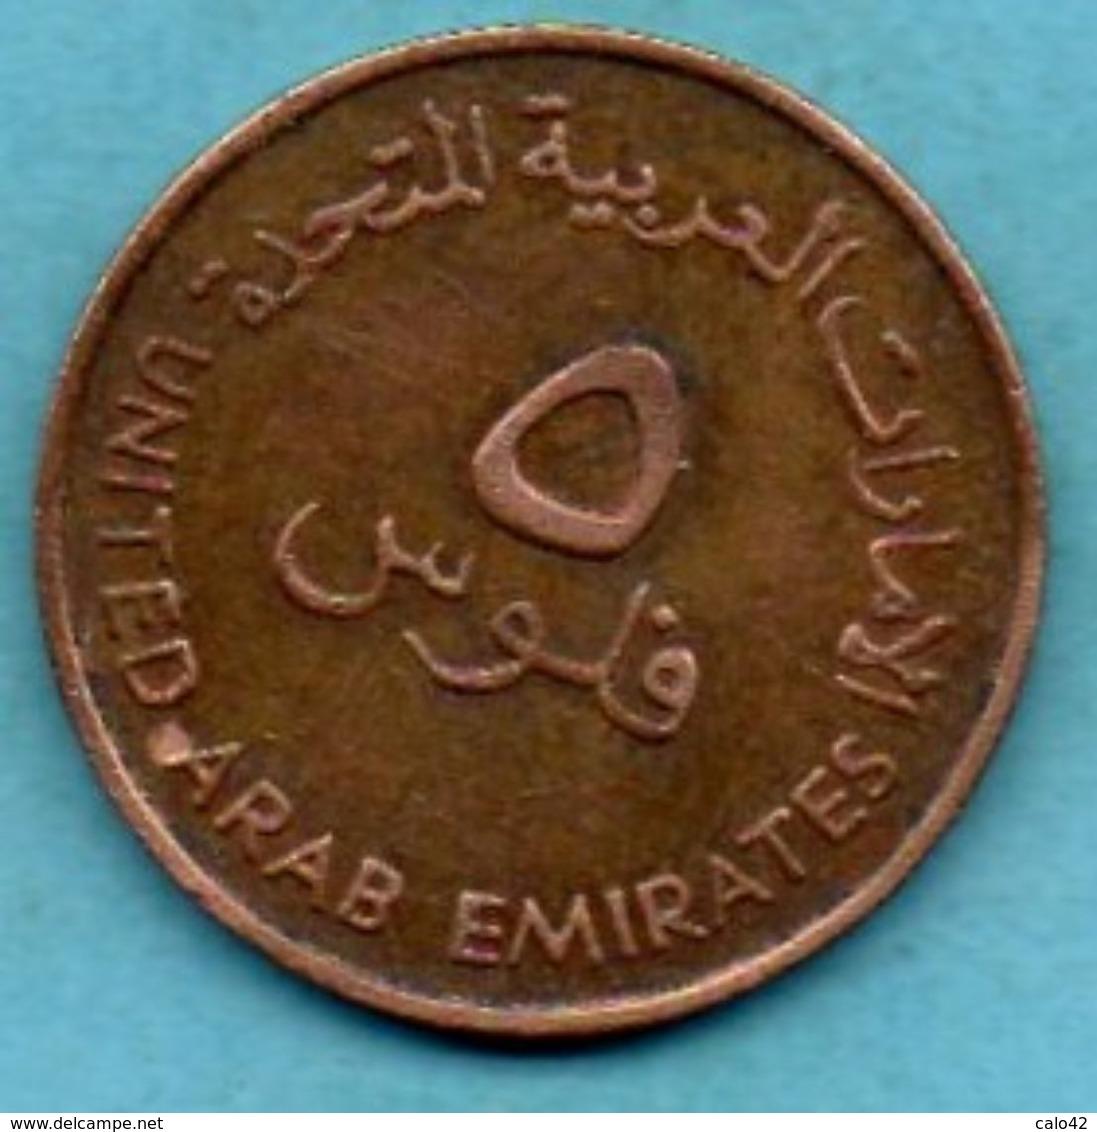 R40/  EMIRATS ARABES / ARAB EMIRATES  5 FILS 1973 / 1393 FAO - Emirats Arabes Unis